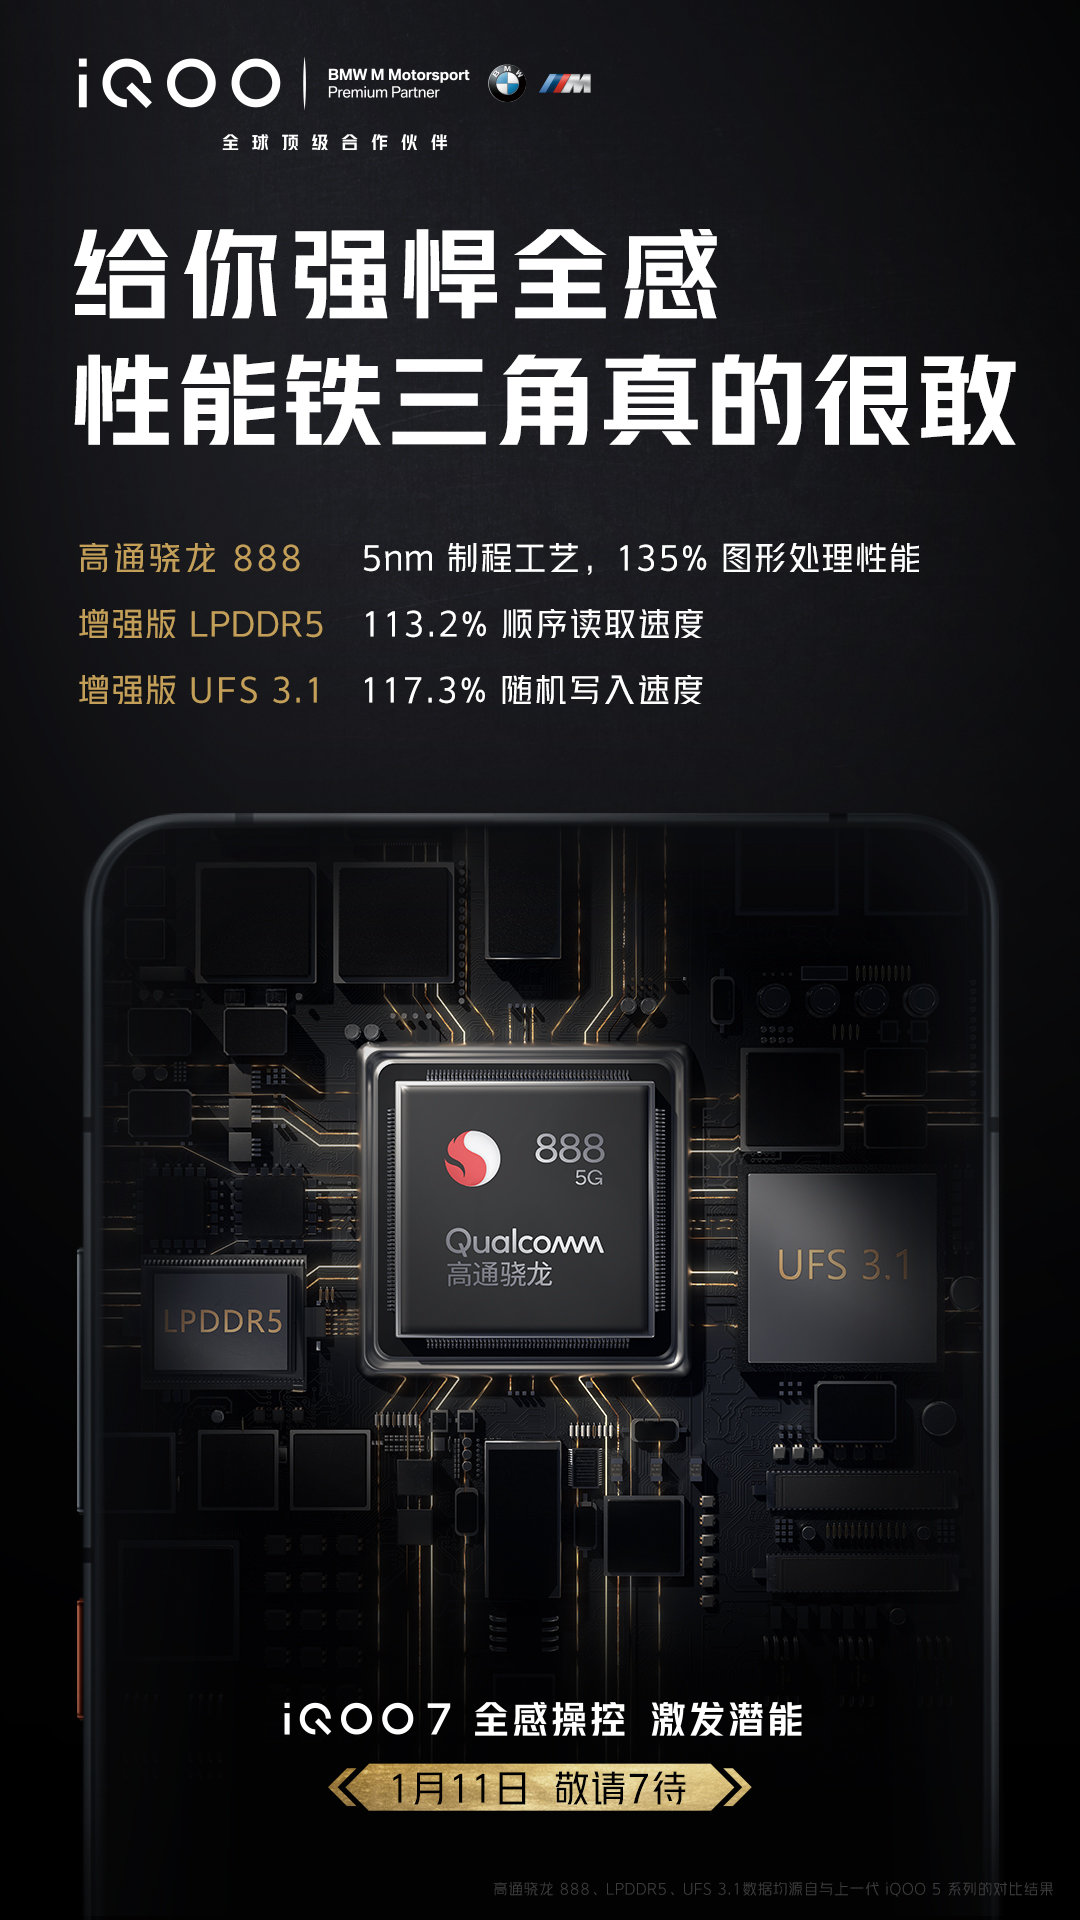 iQOO 7 操控升级:双压感灵敏触控 + 120Hz 刷新率 - 热点资讯 每日推荐 第4张